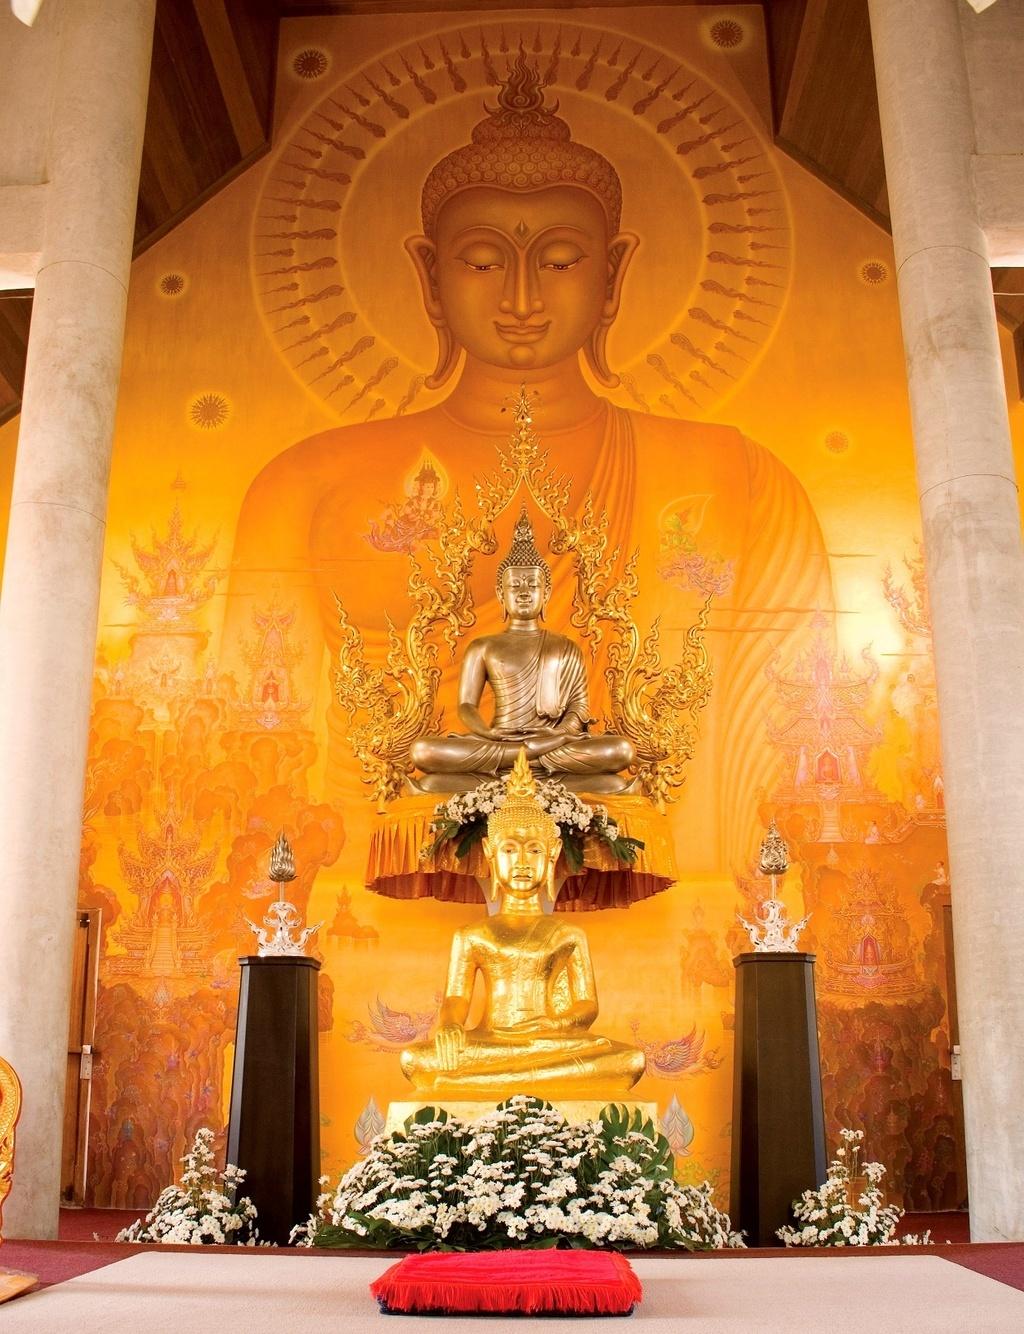 Oltář v Ubusotu - Wat Rong Khun - Thajsko